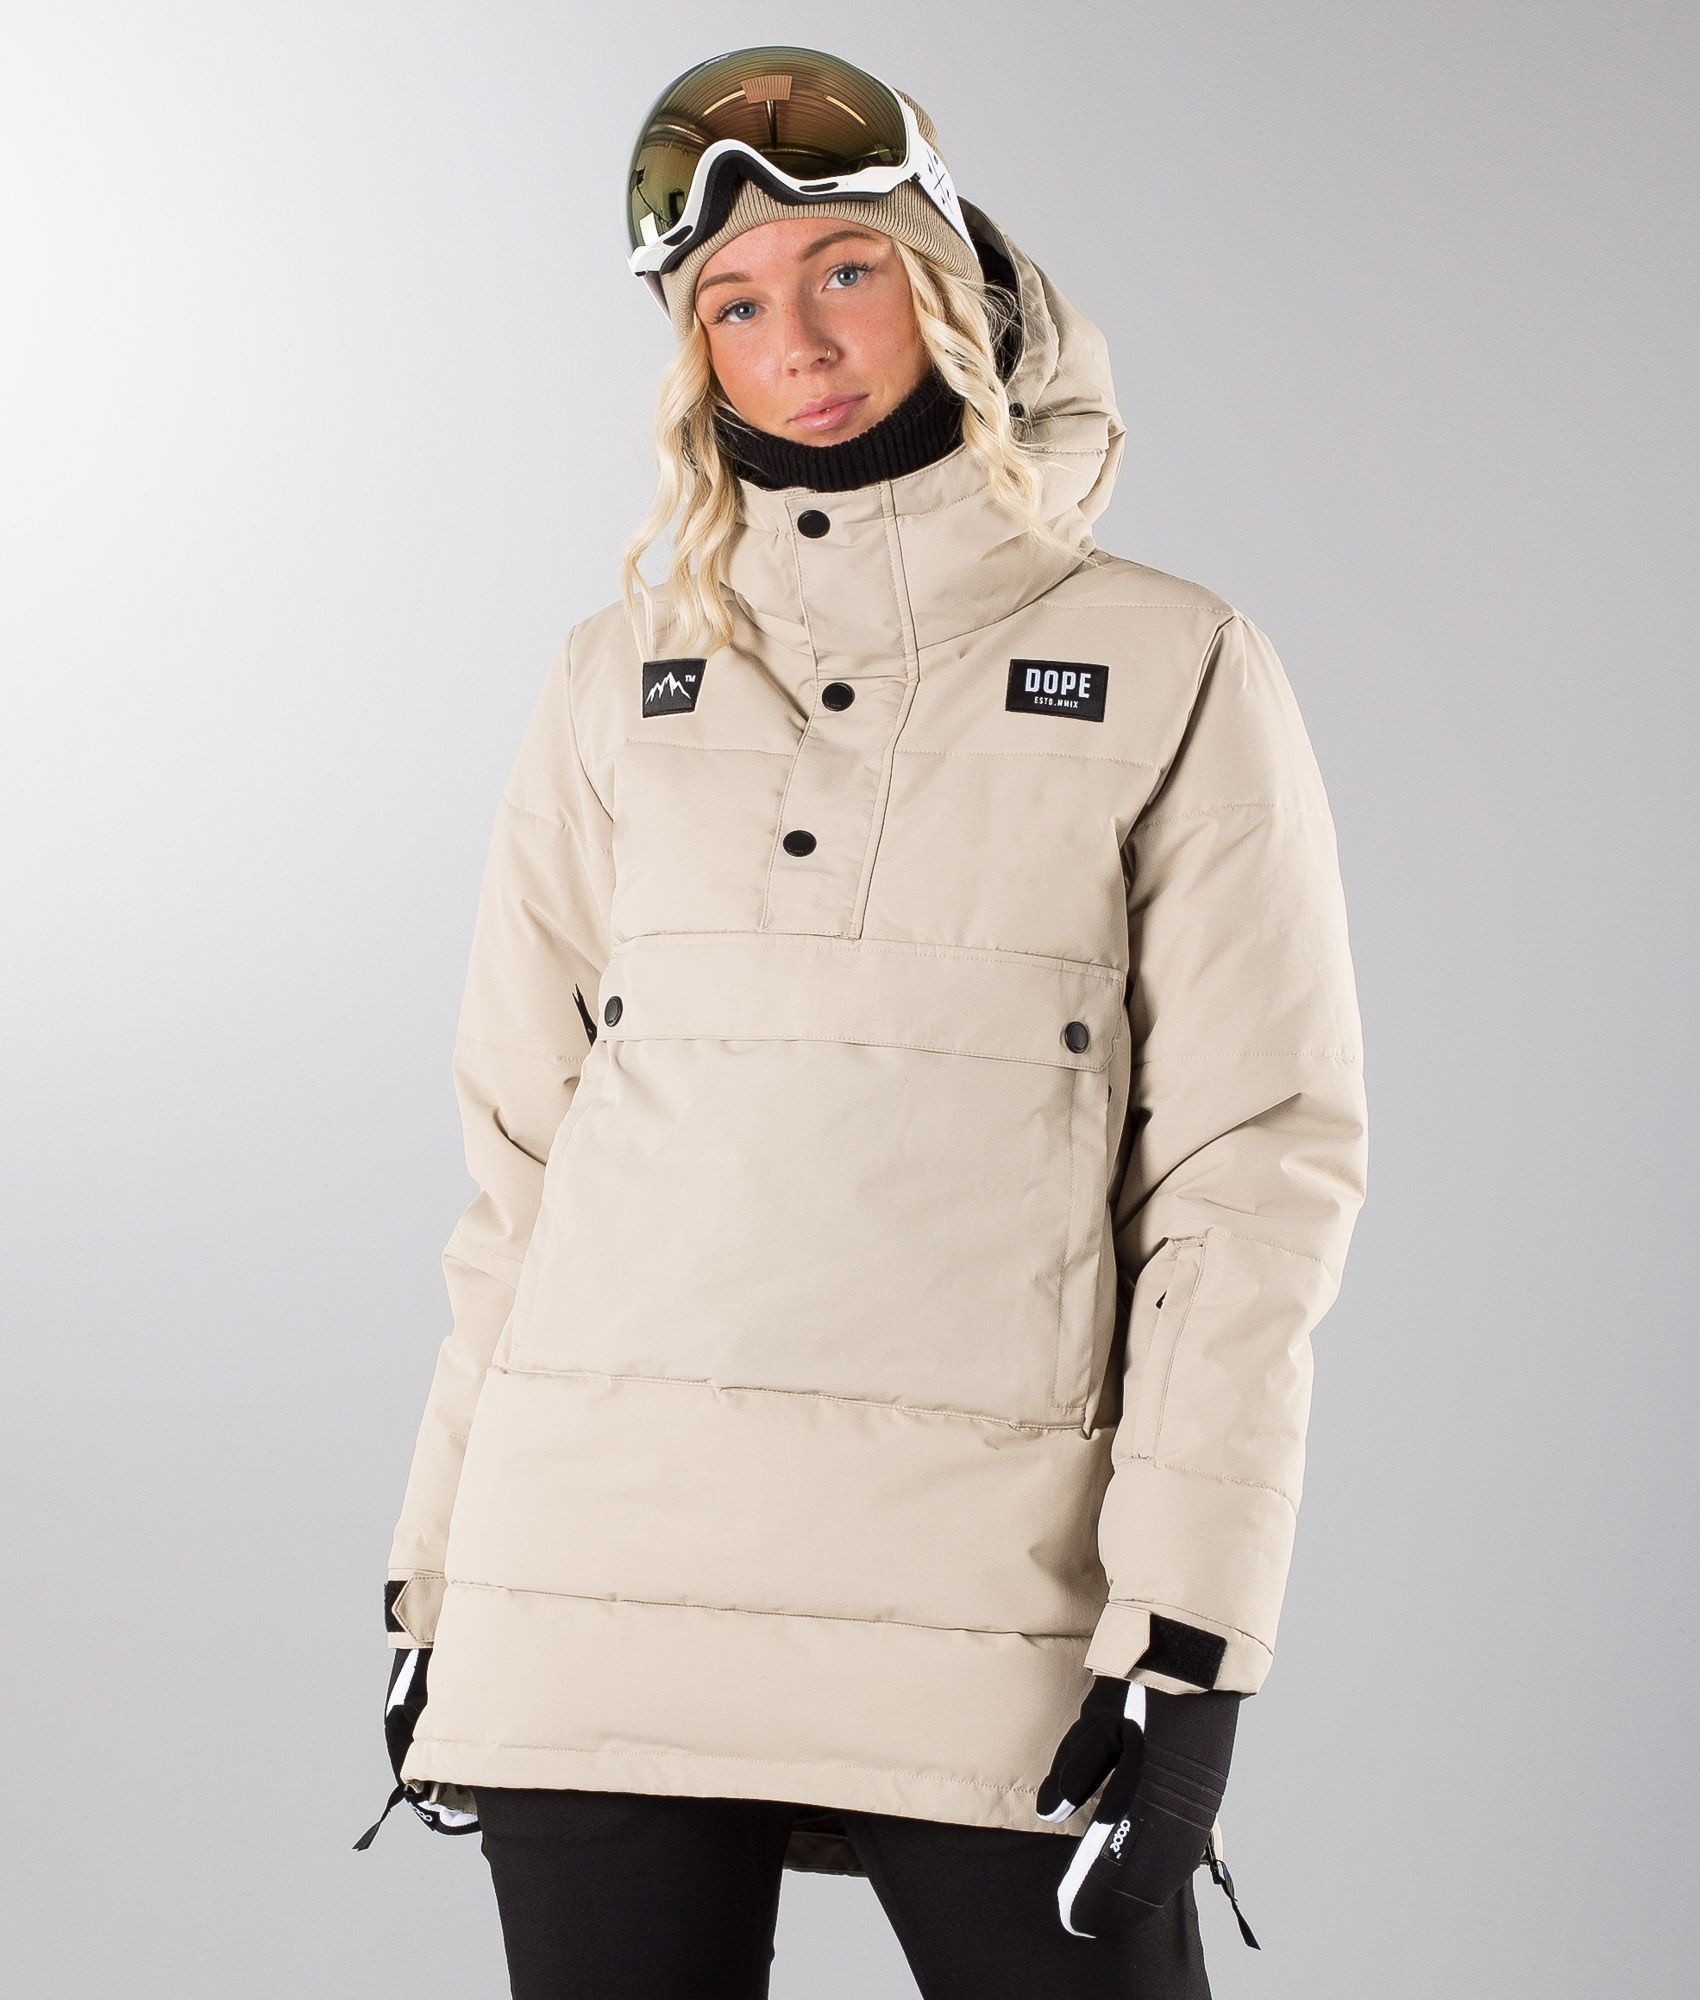 3833222e07c1 Dope Puffer W Snowboard Jacket Sand